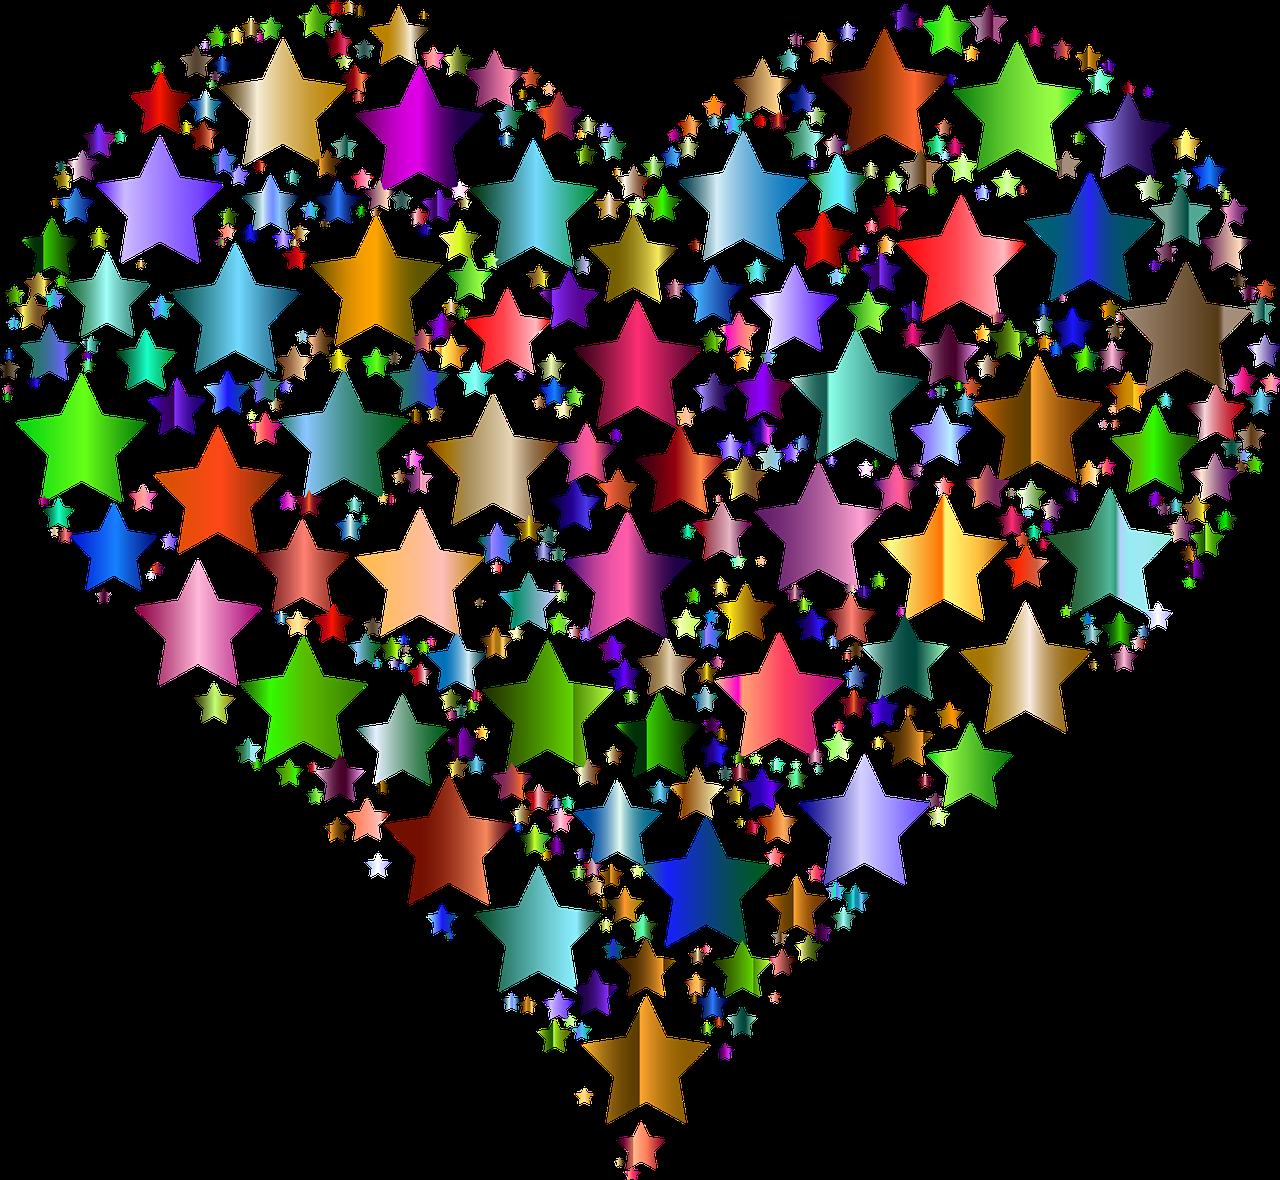 heart-1237269_1280